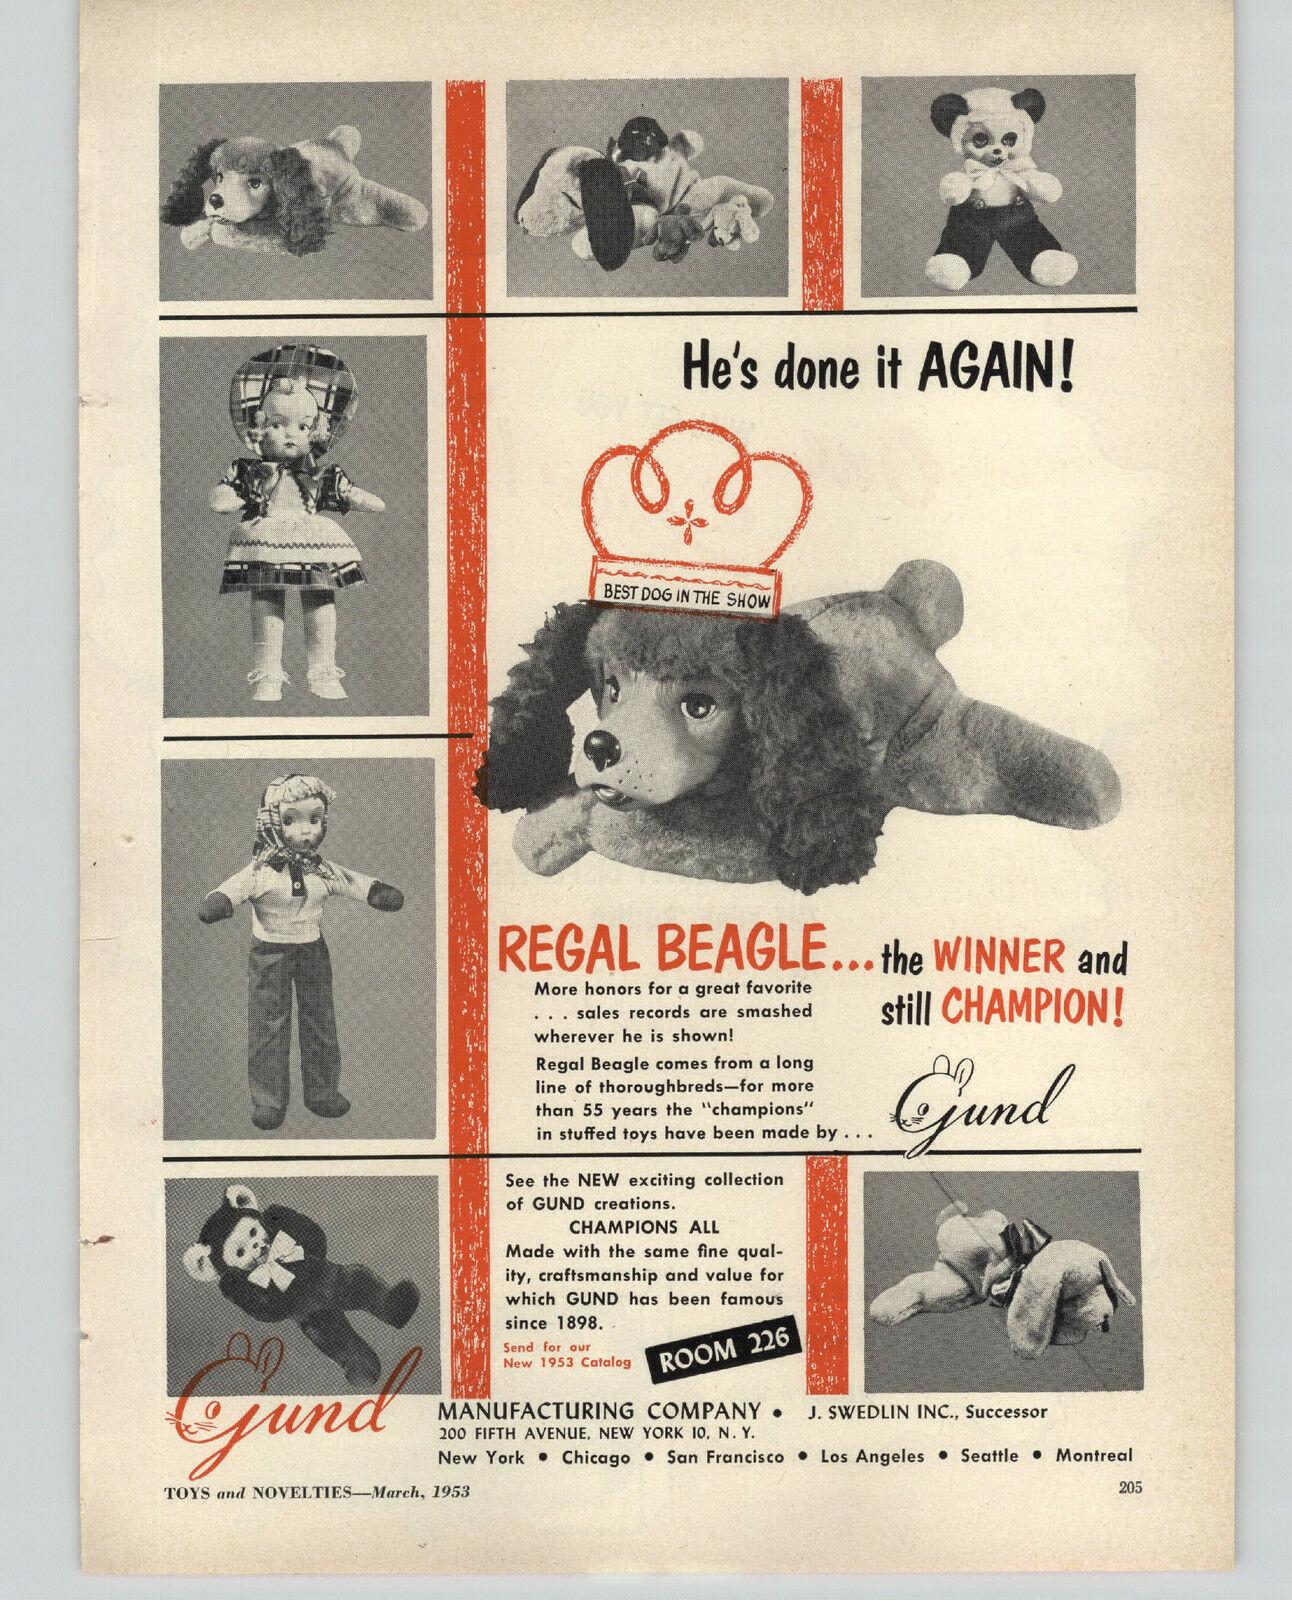 Regal beagle ad